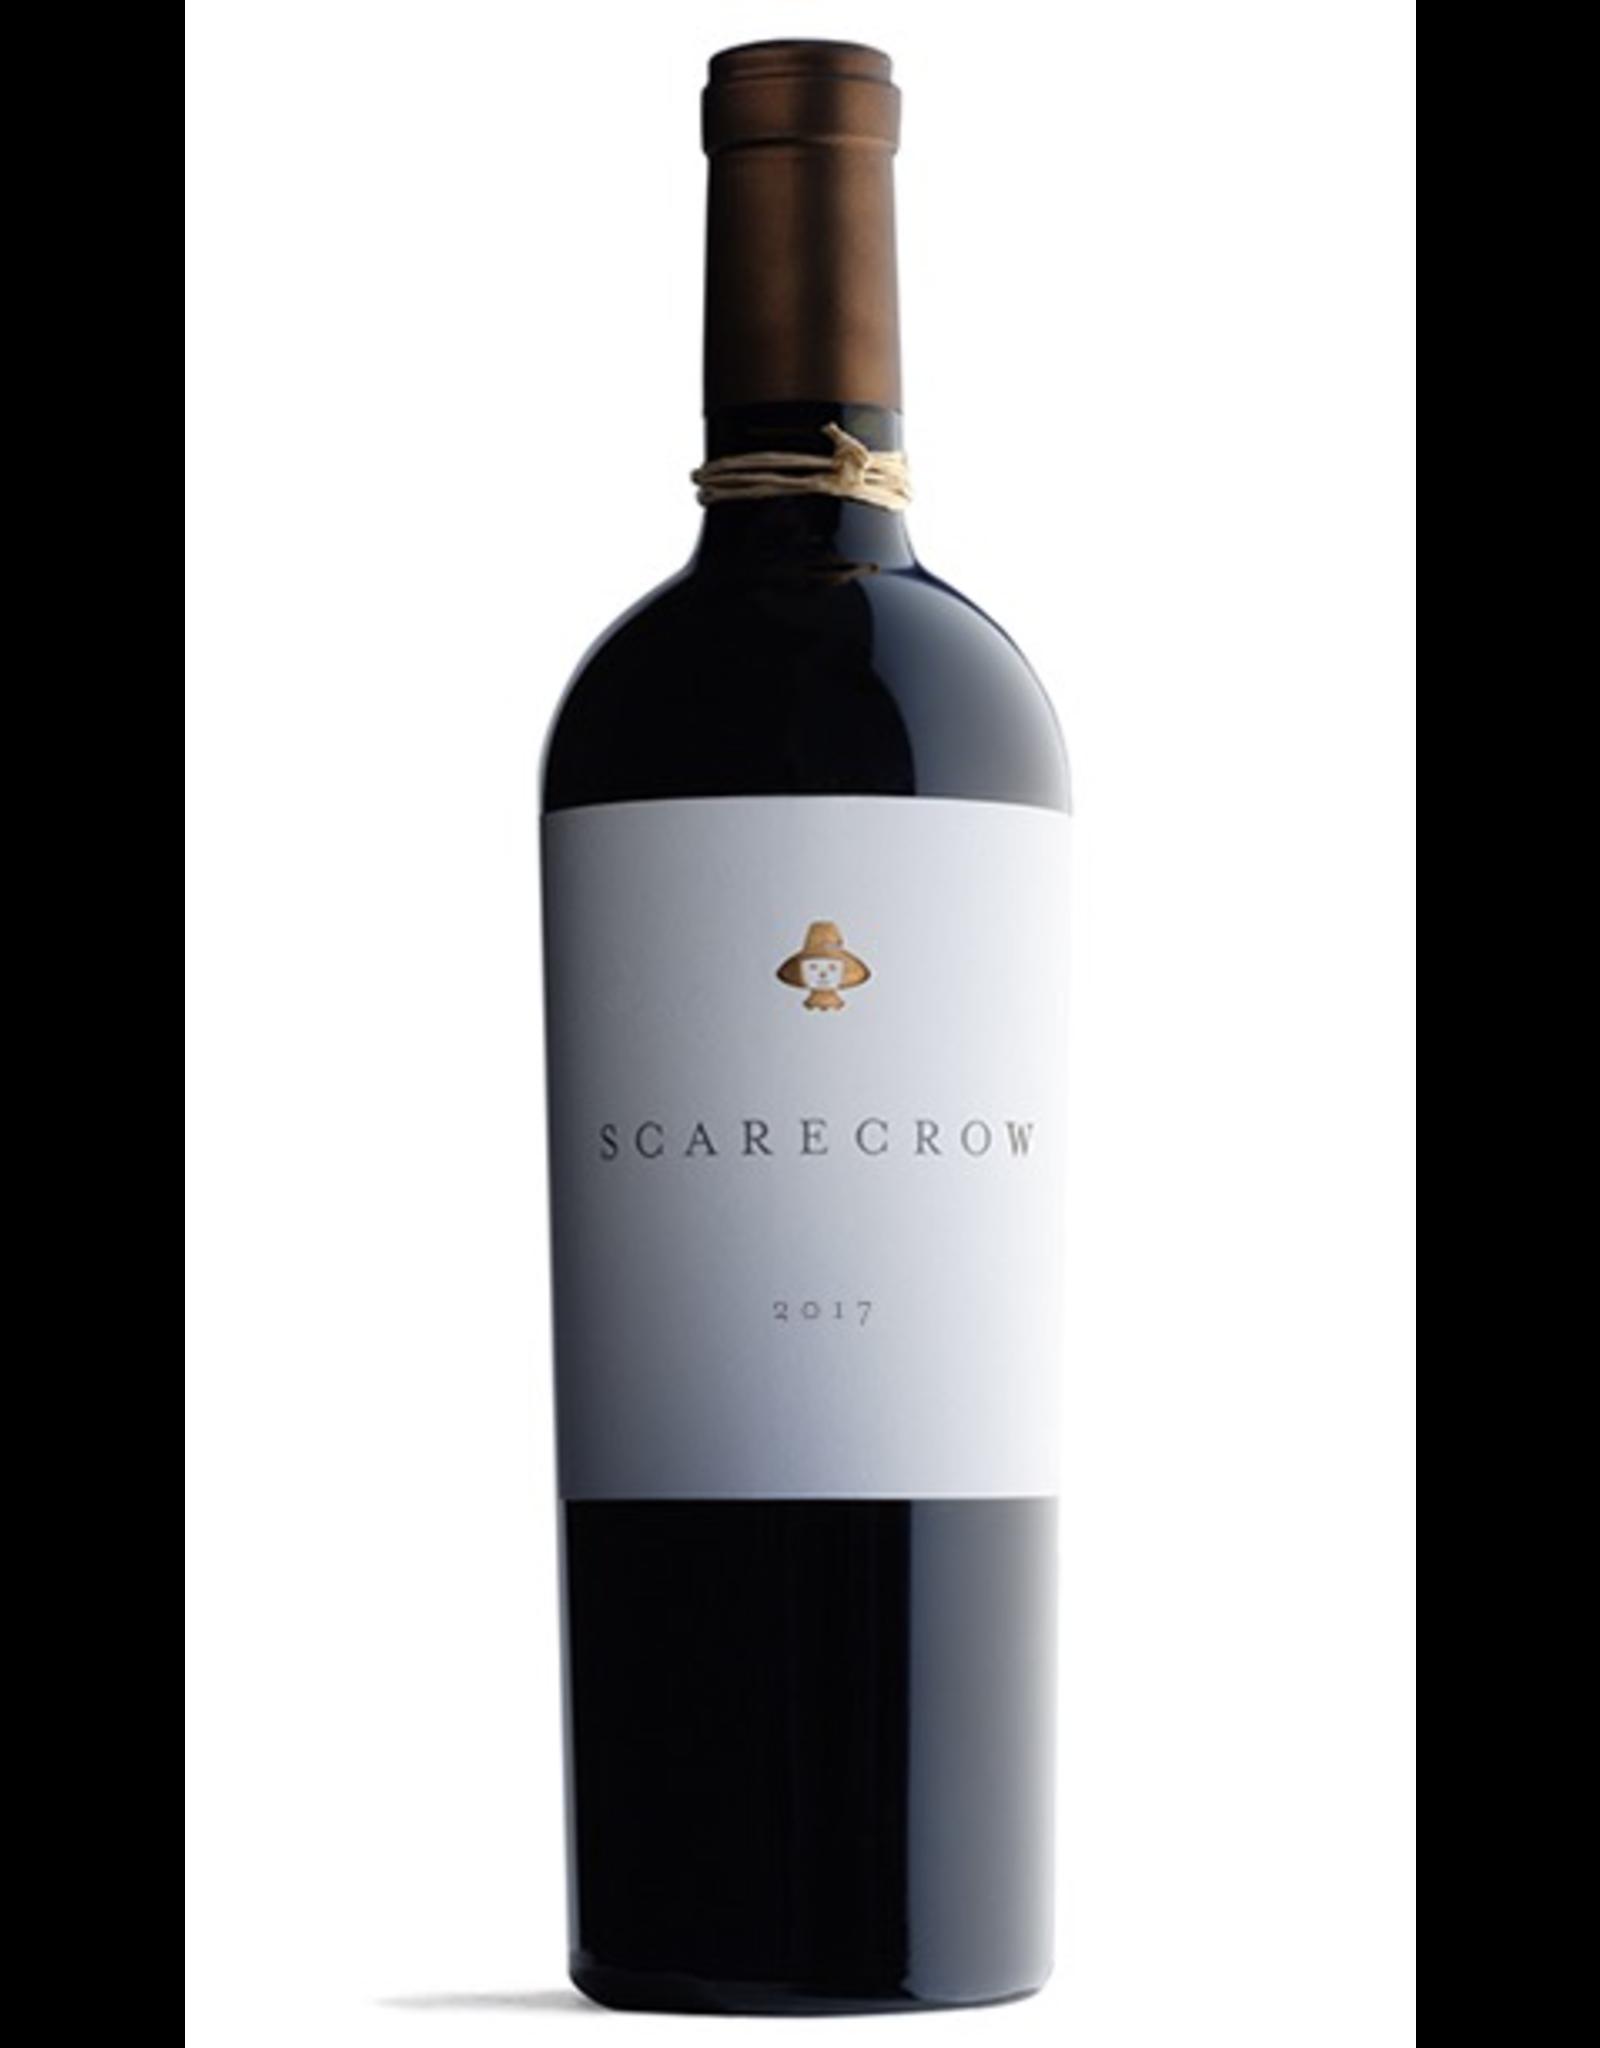 Red Wine 2017, Scarecrow, Cabernet Sauvignon, Rutherford, Napa Valley, California, 14.9% Alc, CTnr  RP97